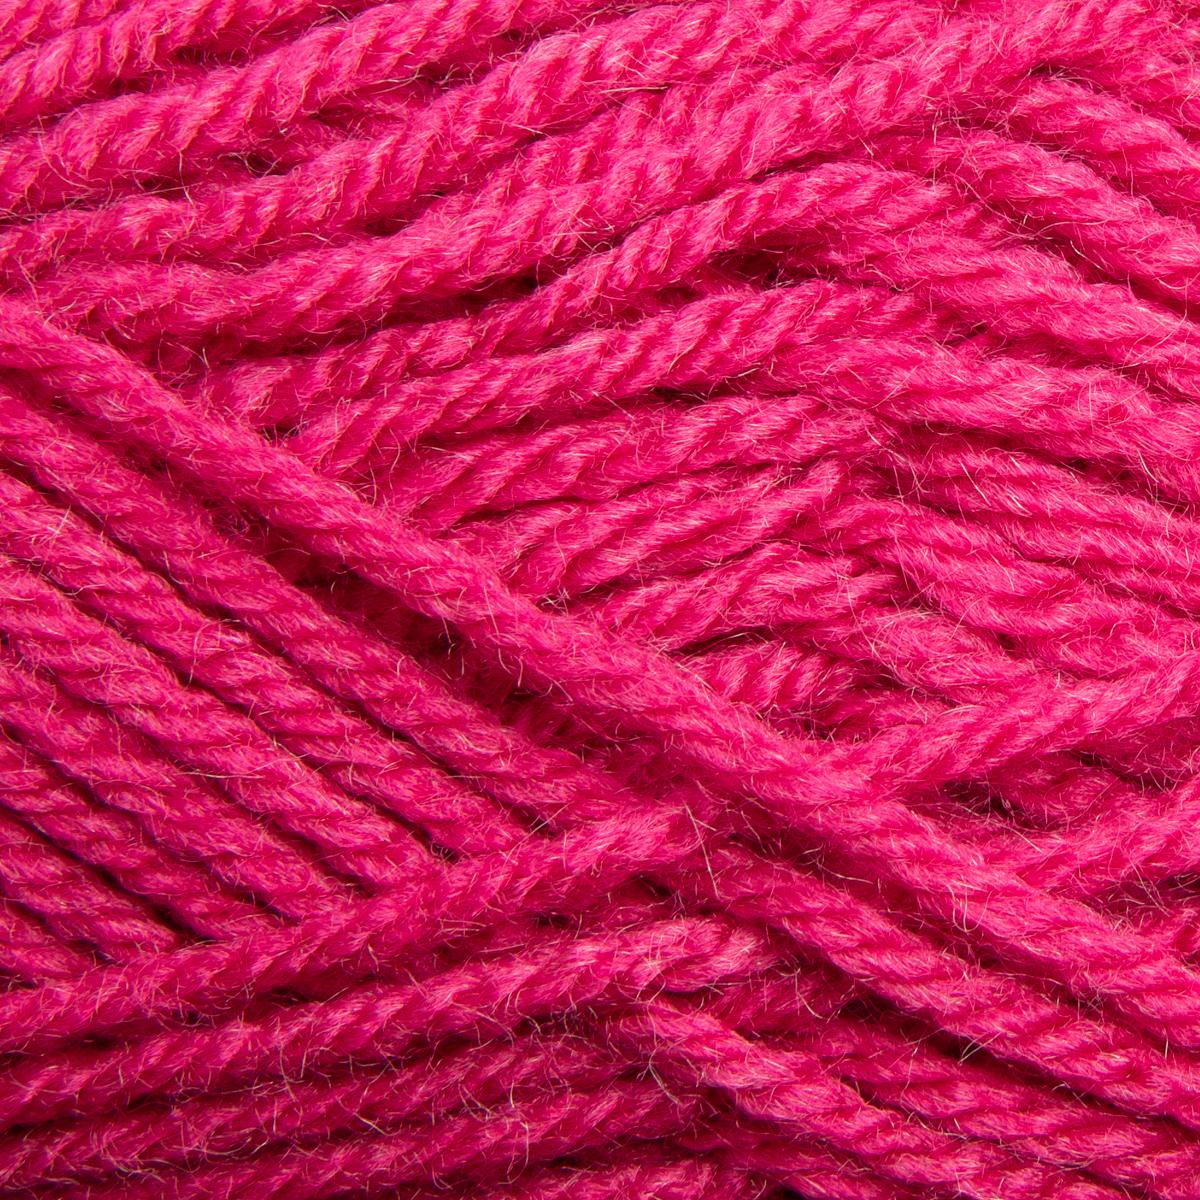 3pk-Lion-Brand-Vanna-s-Choice-100-Acrylic-Yarn-Medium-4-Knitting-Skeins-Soft thumbnail 51